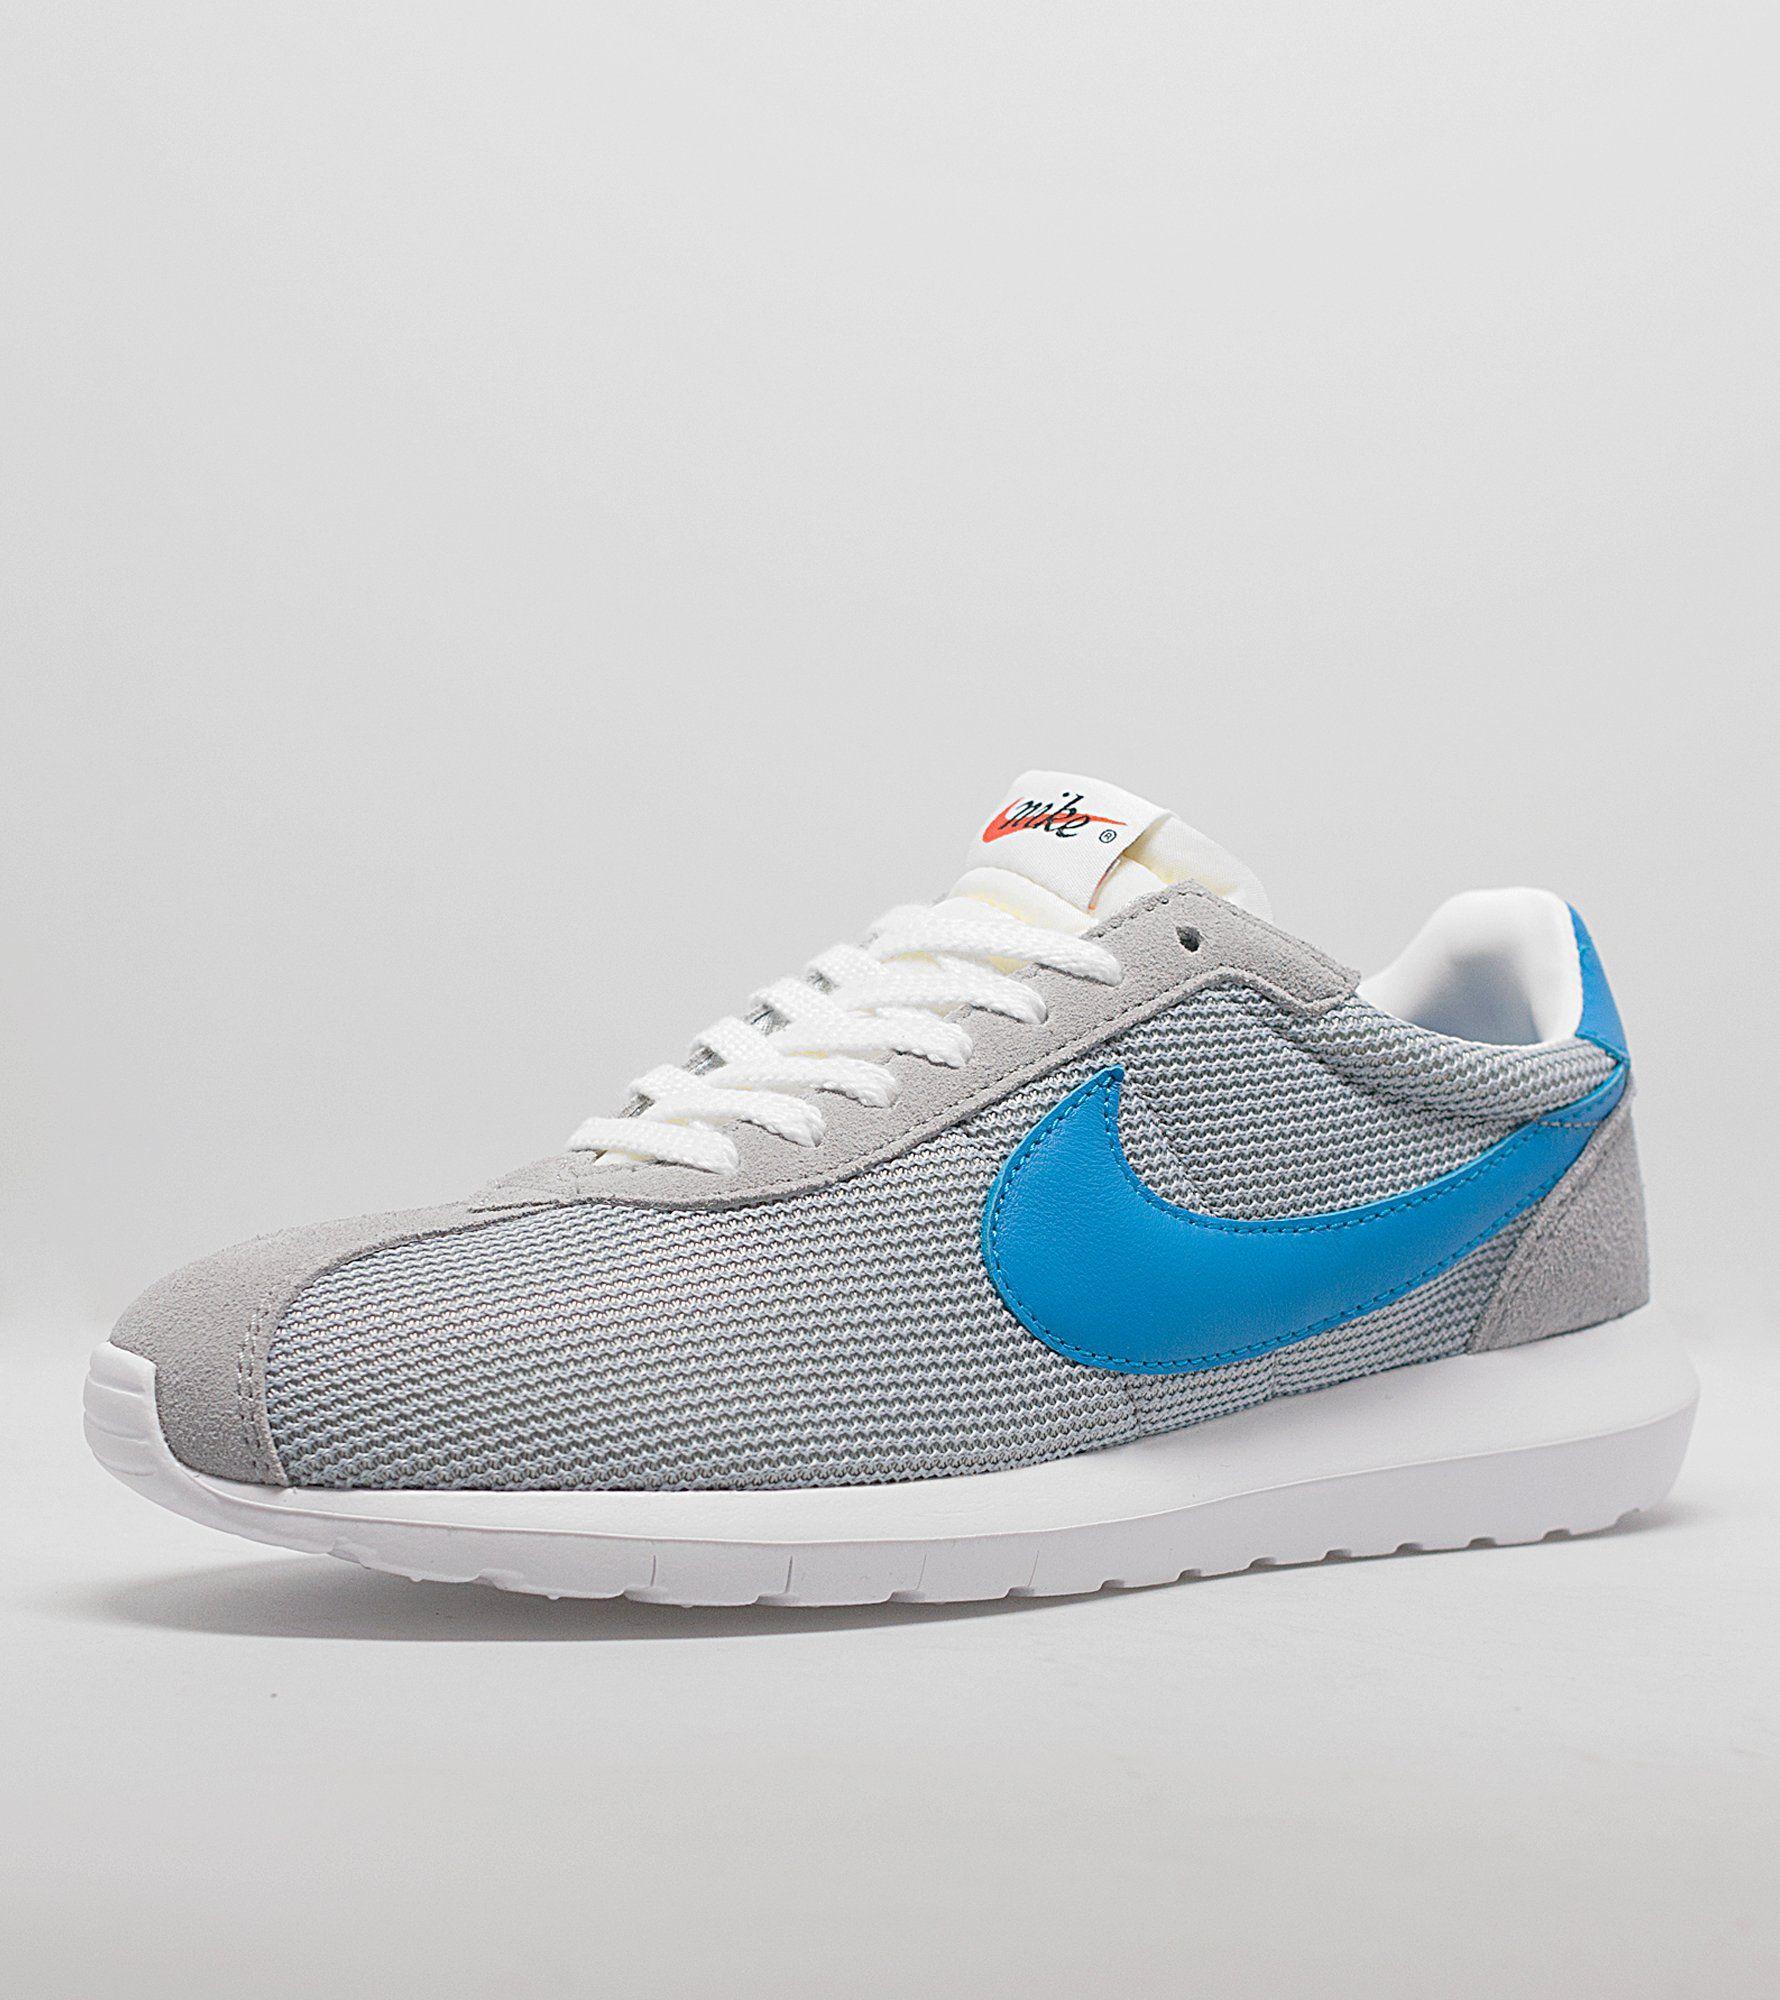 jtkmq Nike Roshe LD1000 QS | Size?